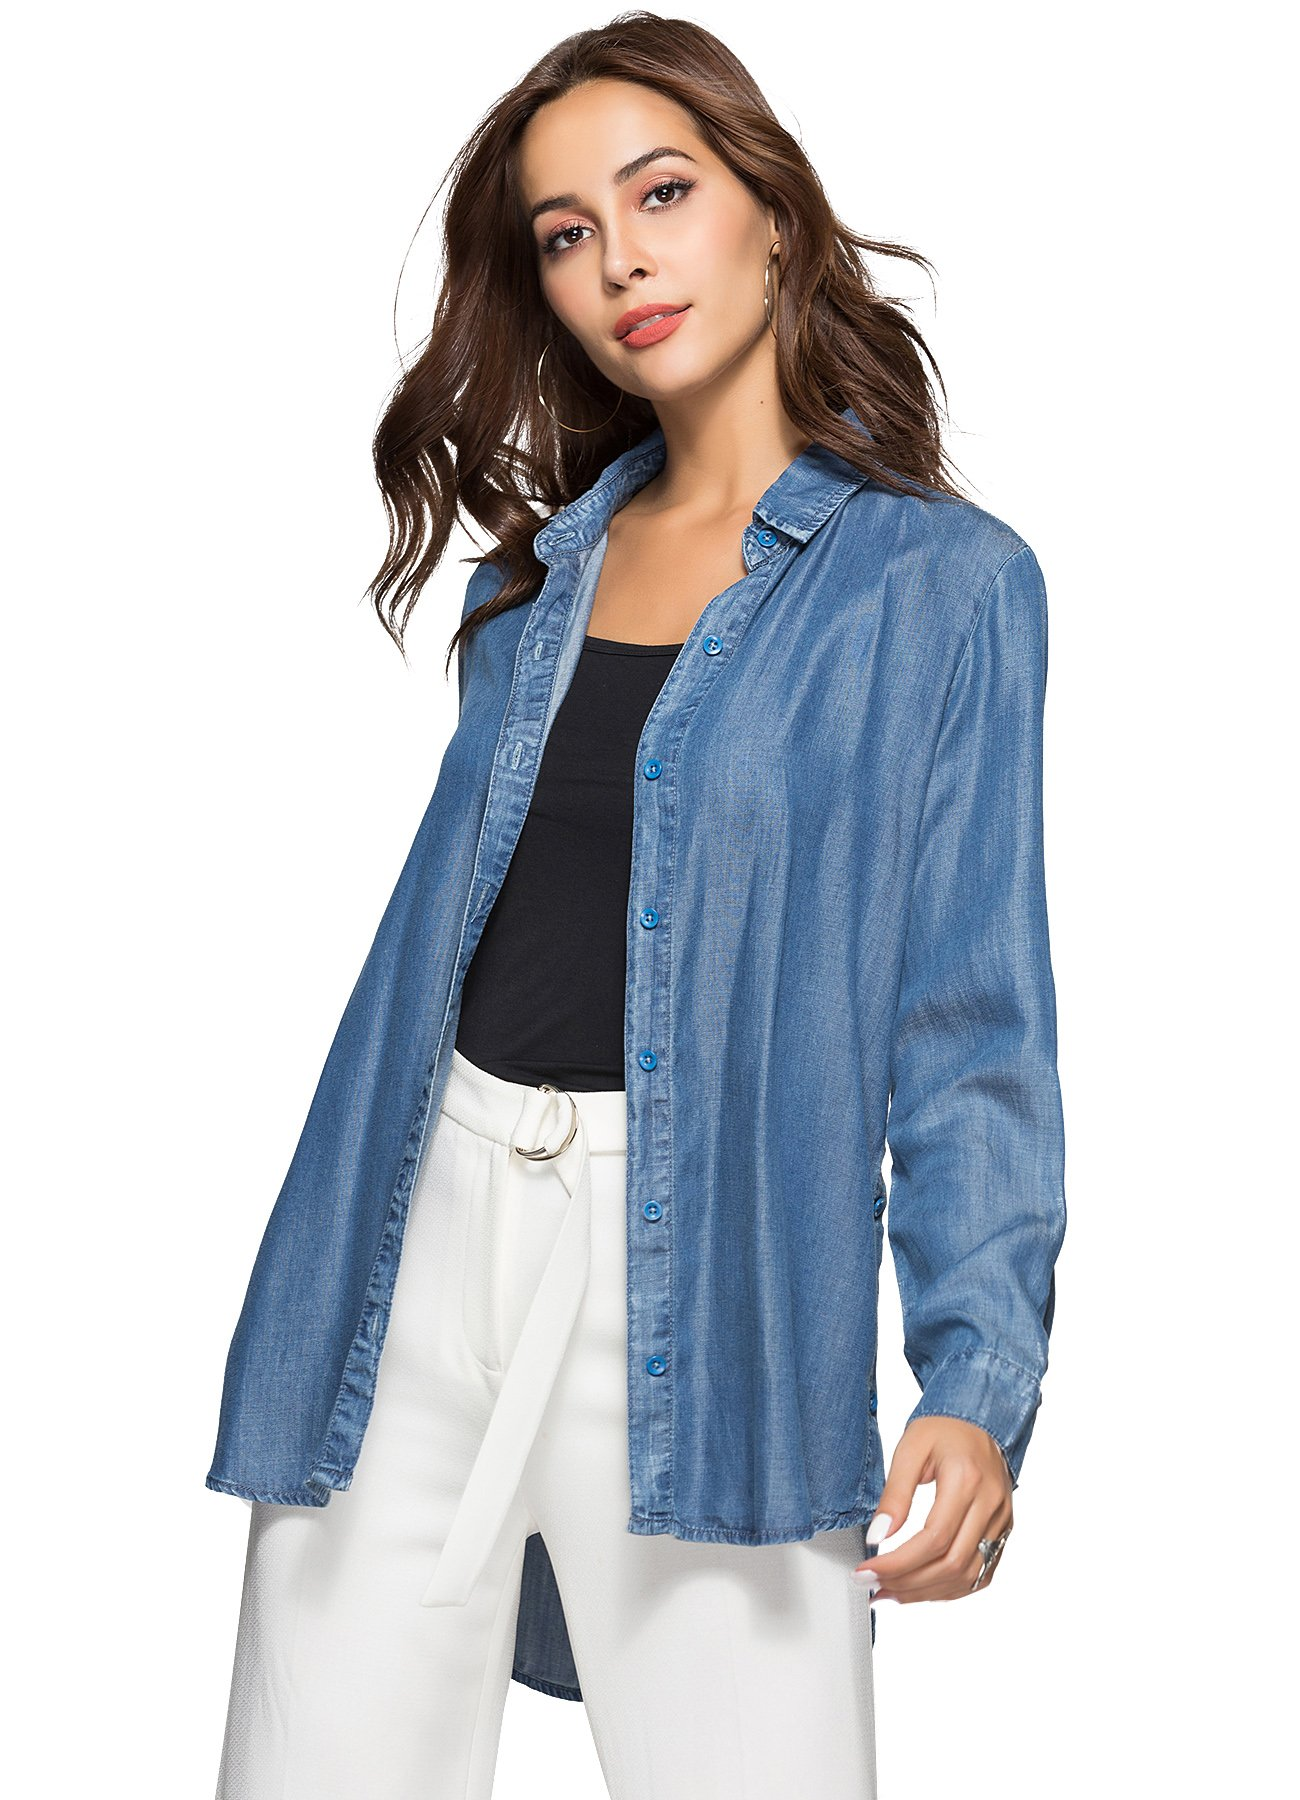 Escalier Women's Denim Shirt Chambray Tencel Long Sleeve Button Down Shirts Oversize Blouse Blue L